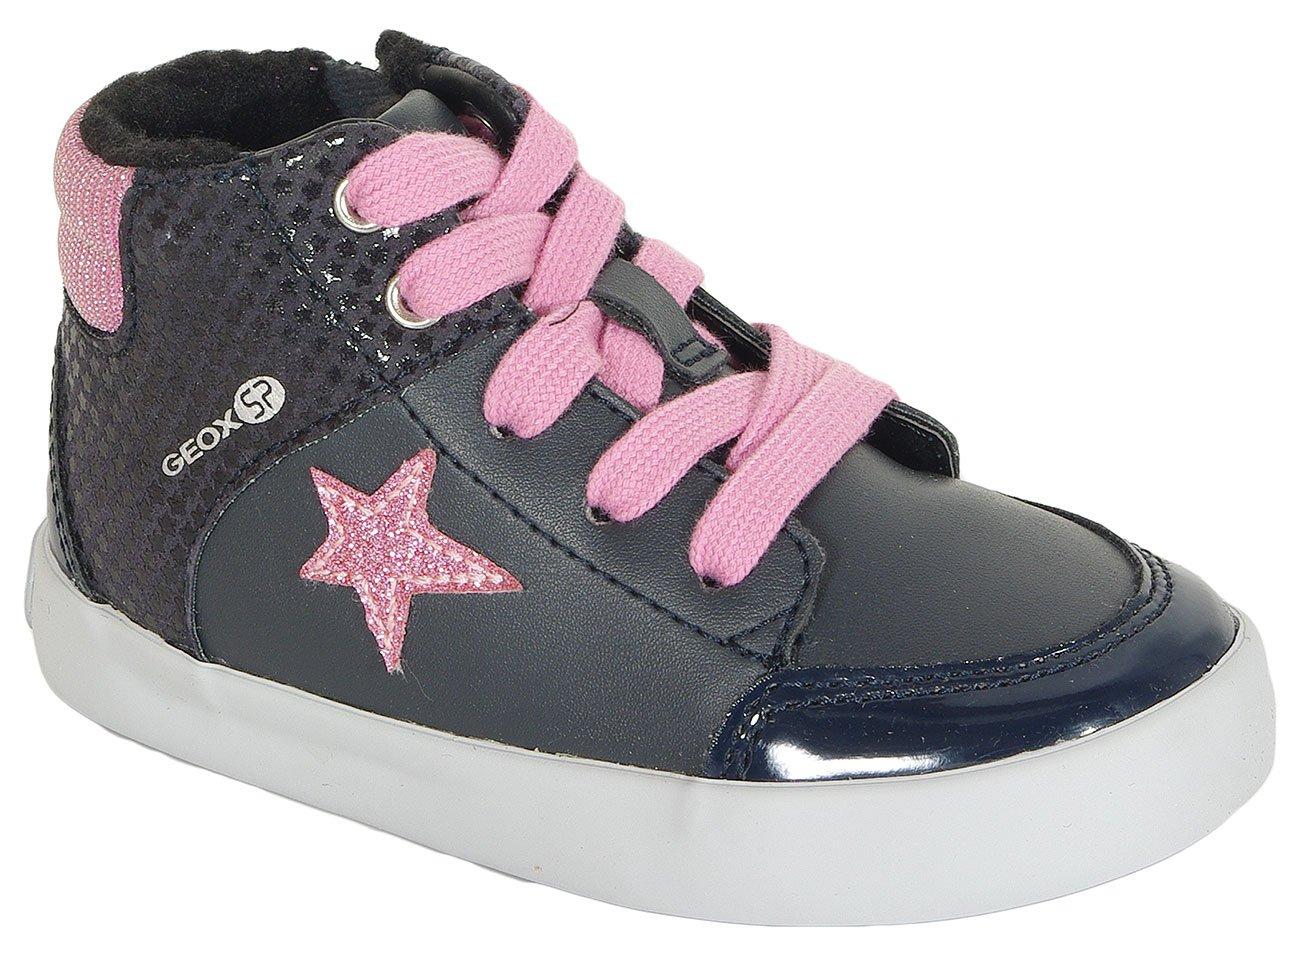 GEOX Gisli A sneakers GBK+suede navy/dk pink